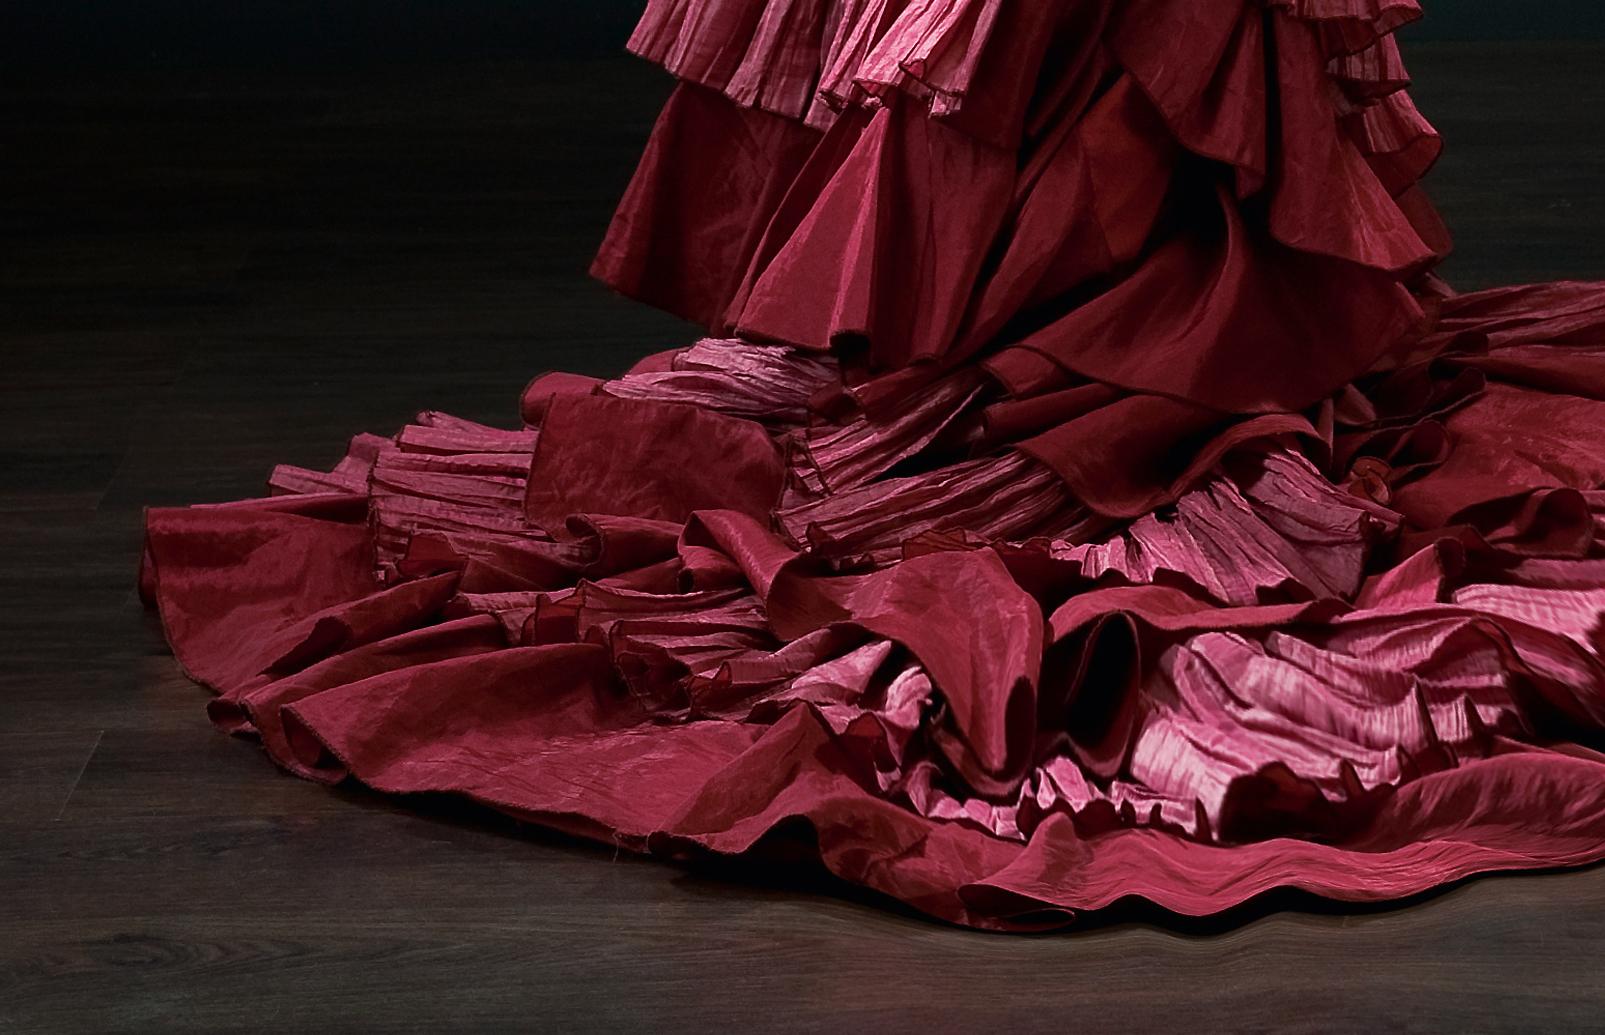 farben symbolik rot und seine bedeutung alpina farbe wirkung. Black Bedroom Furniture Sets. Home Design Ideas